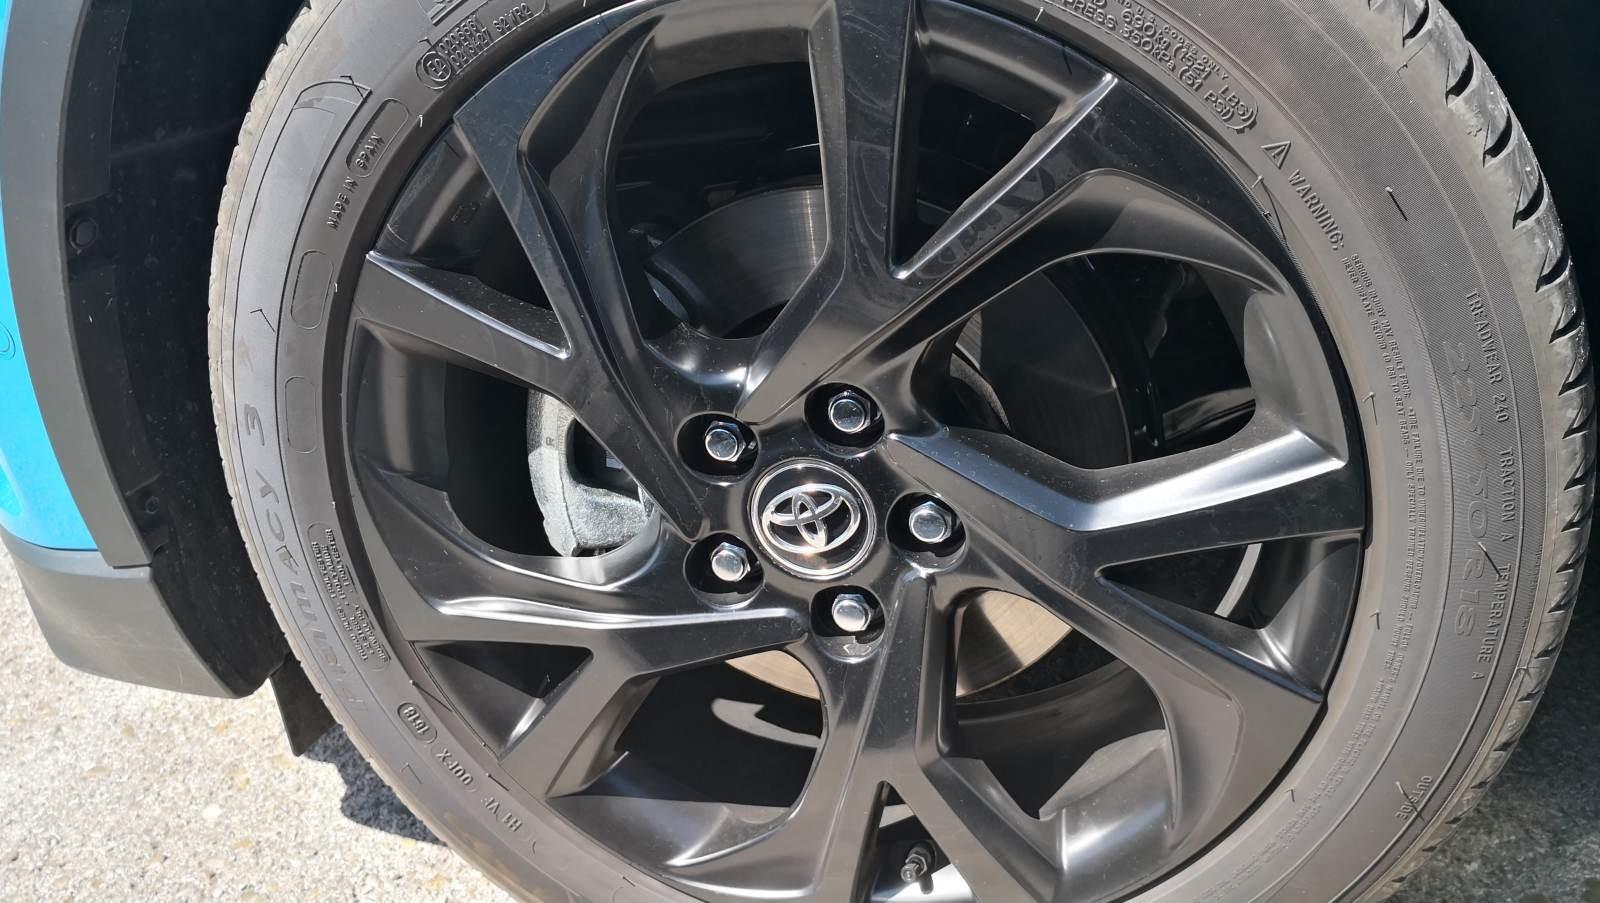 Foto de Toyota C-HR Dynamic Plus - Fotos interiores y detalles (15/15)